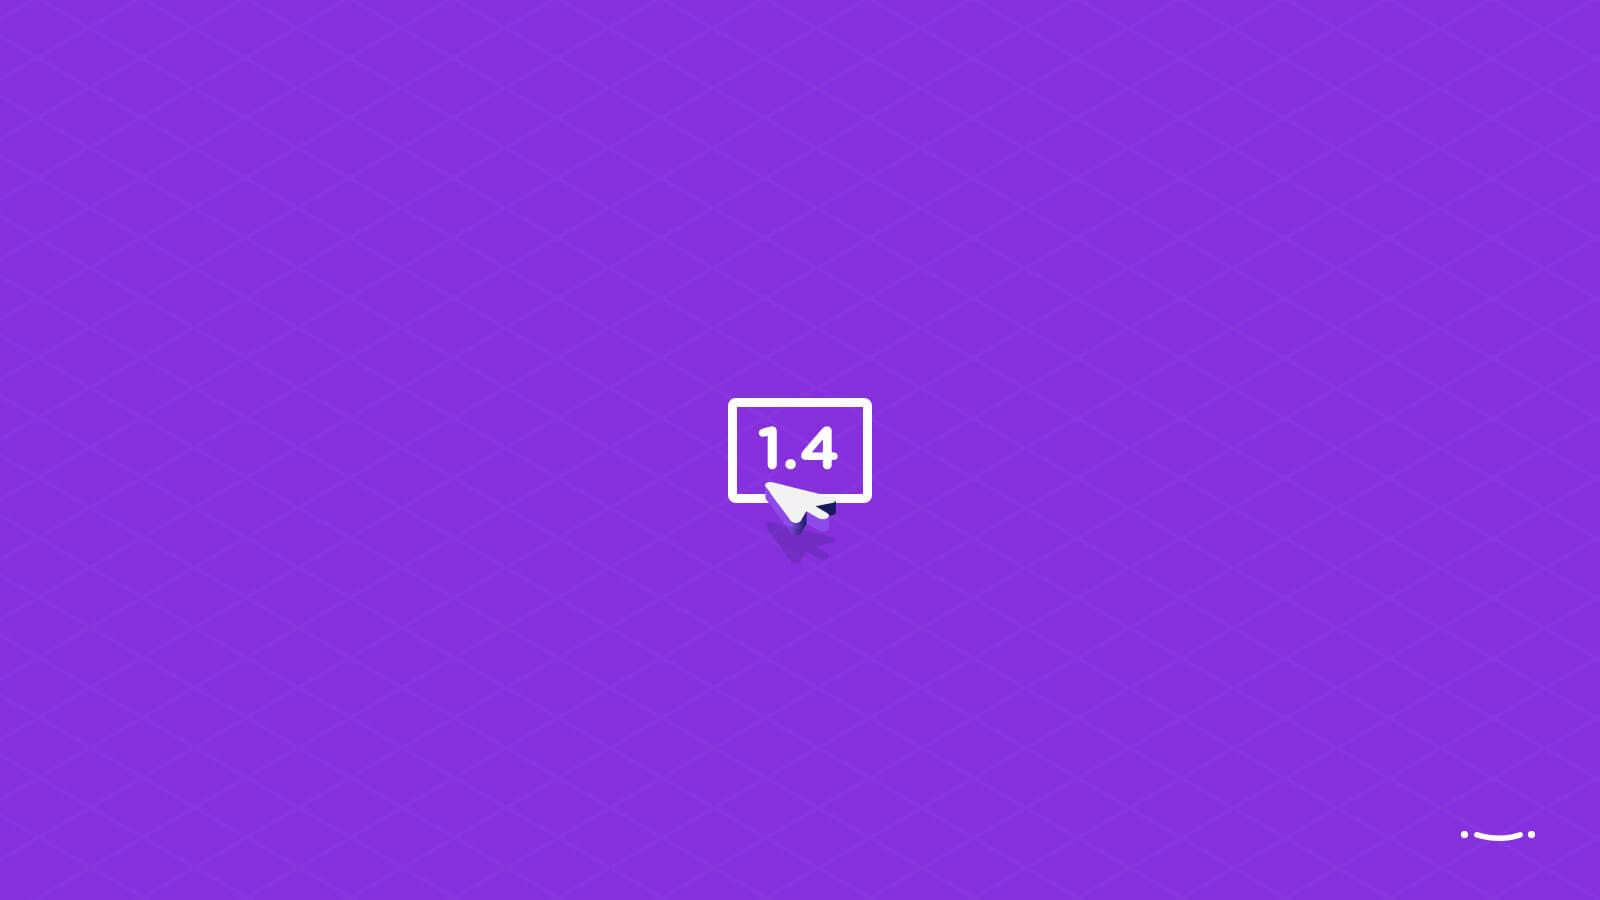 Indie 1.4 - get rewarded for bringing your friends to Indie